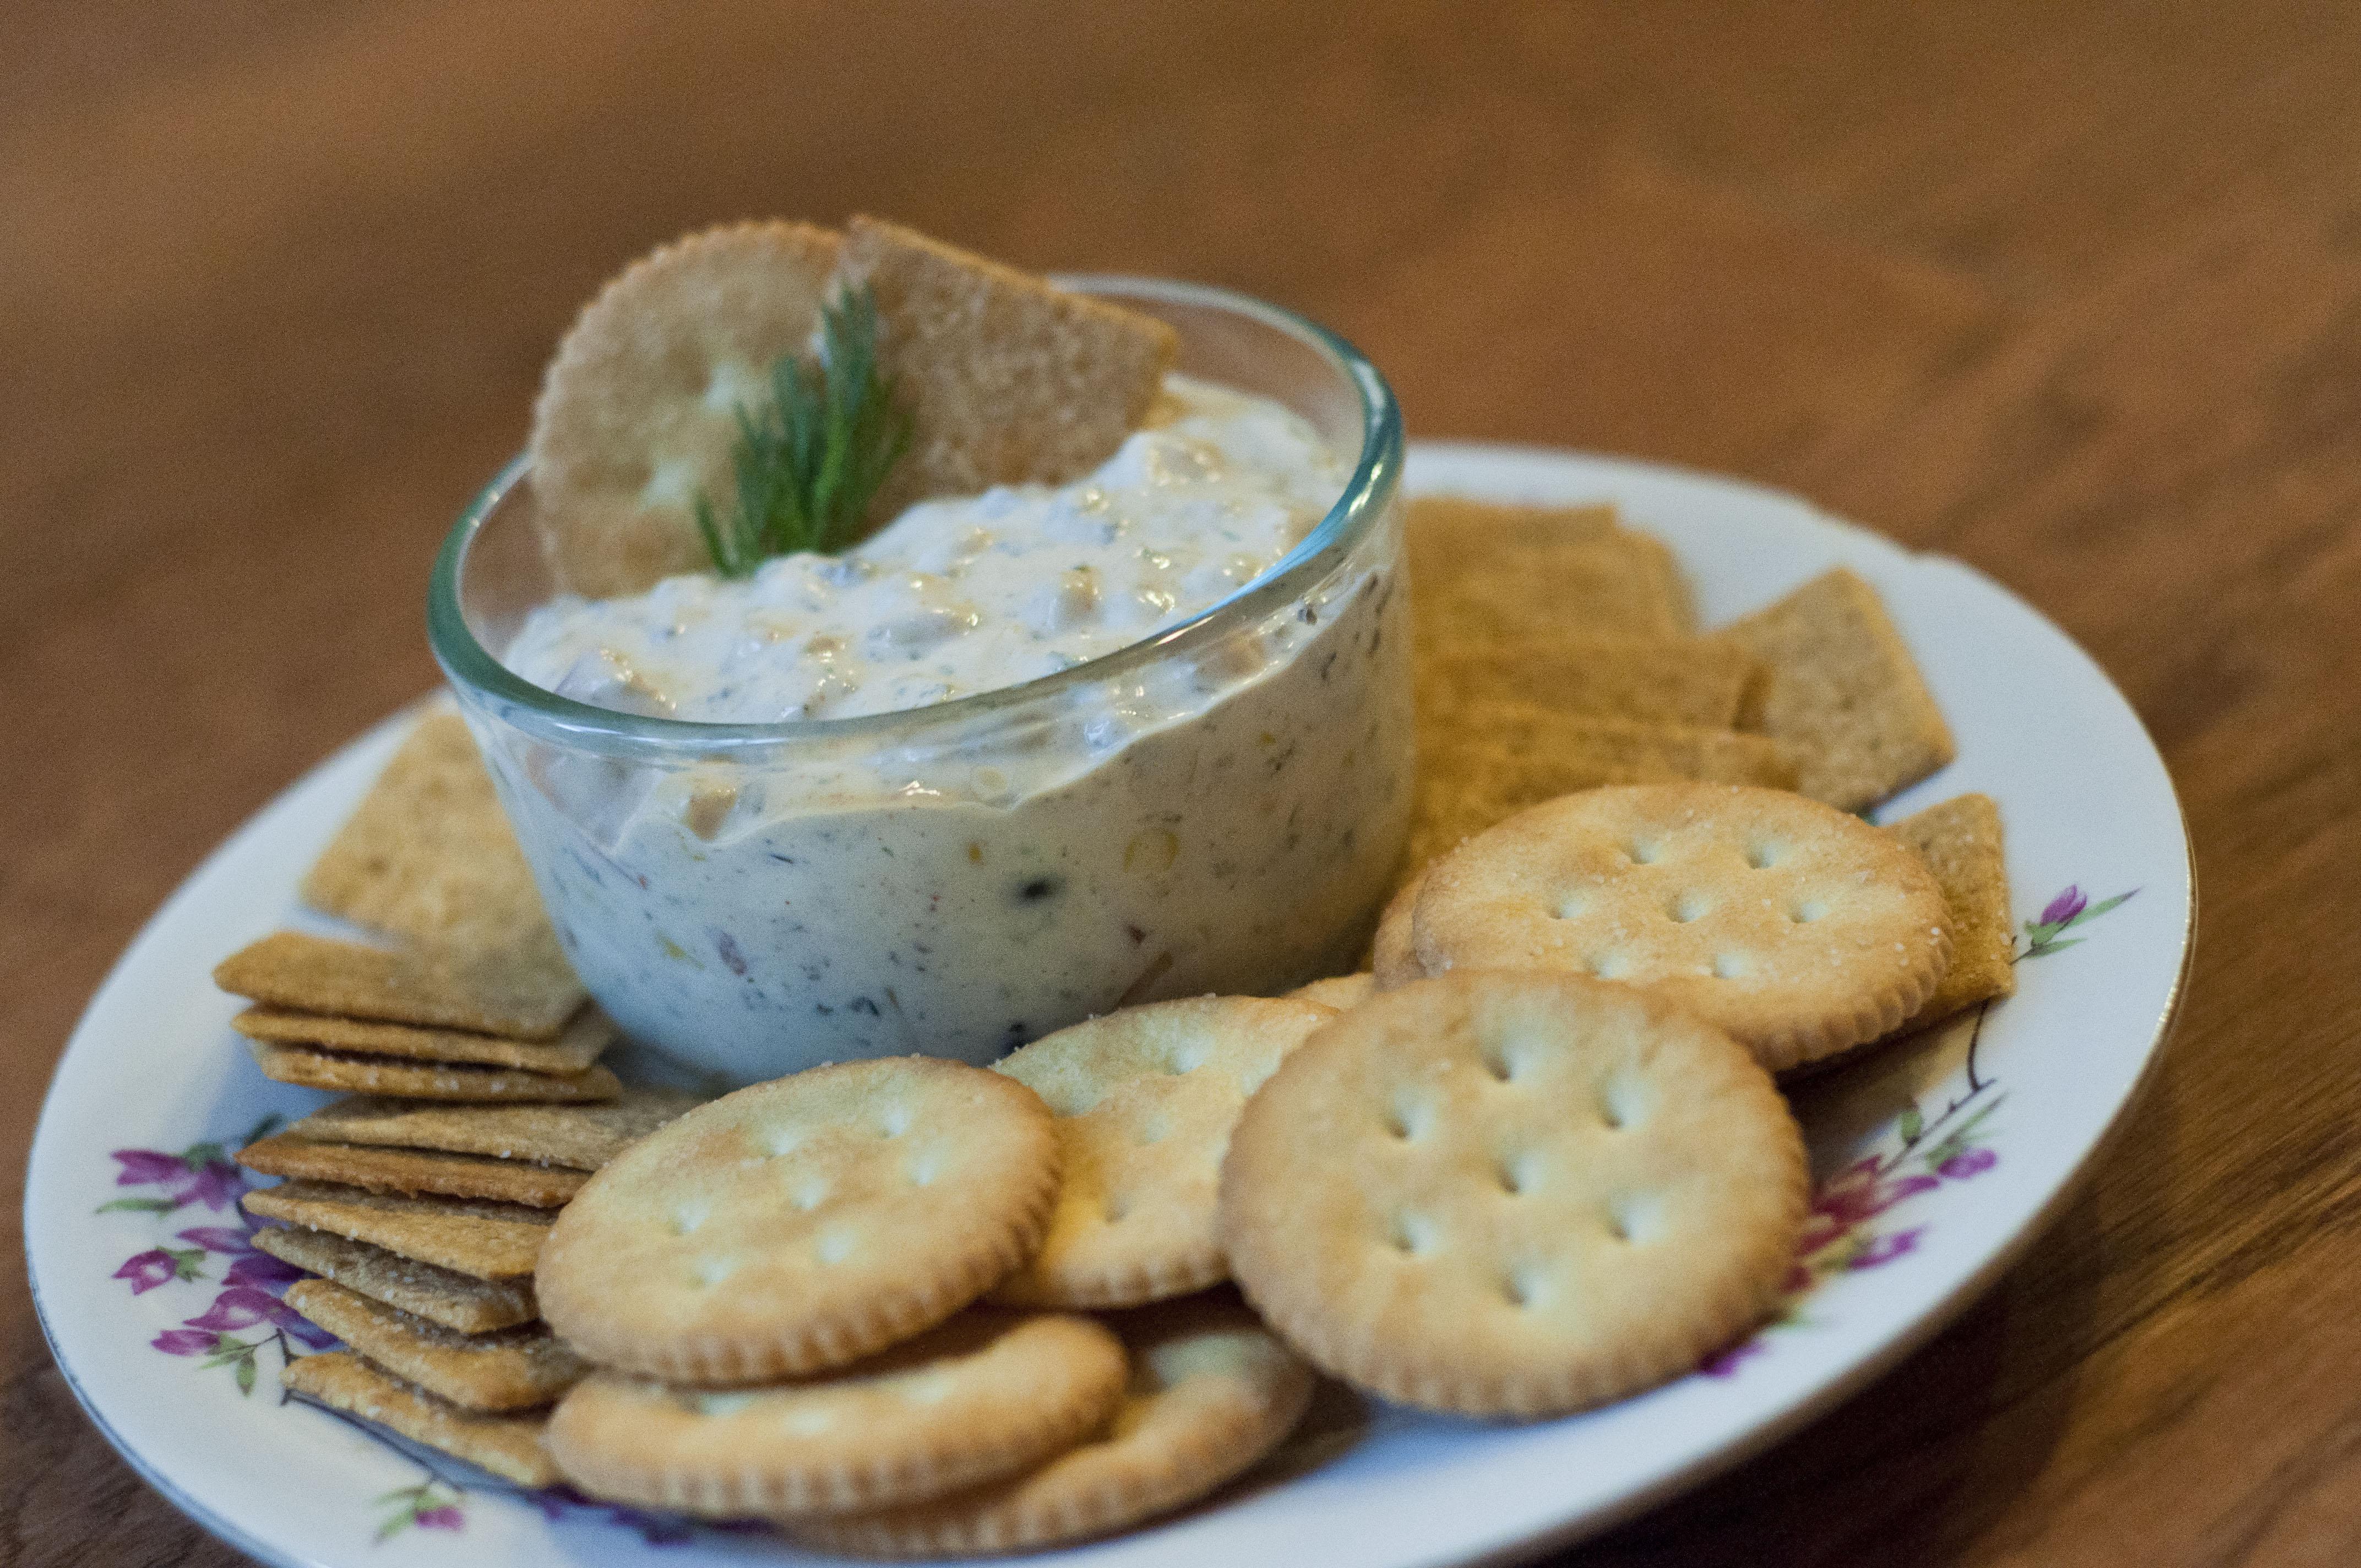 party dip, fourth of july recipe, easy dip, ranch packet recipe, kid friendly dip, simple dip recipe, recipes, cooking, food, taste arkansas